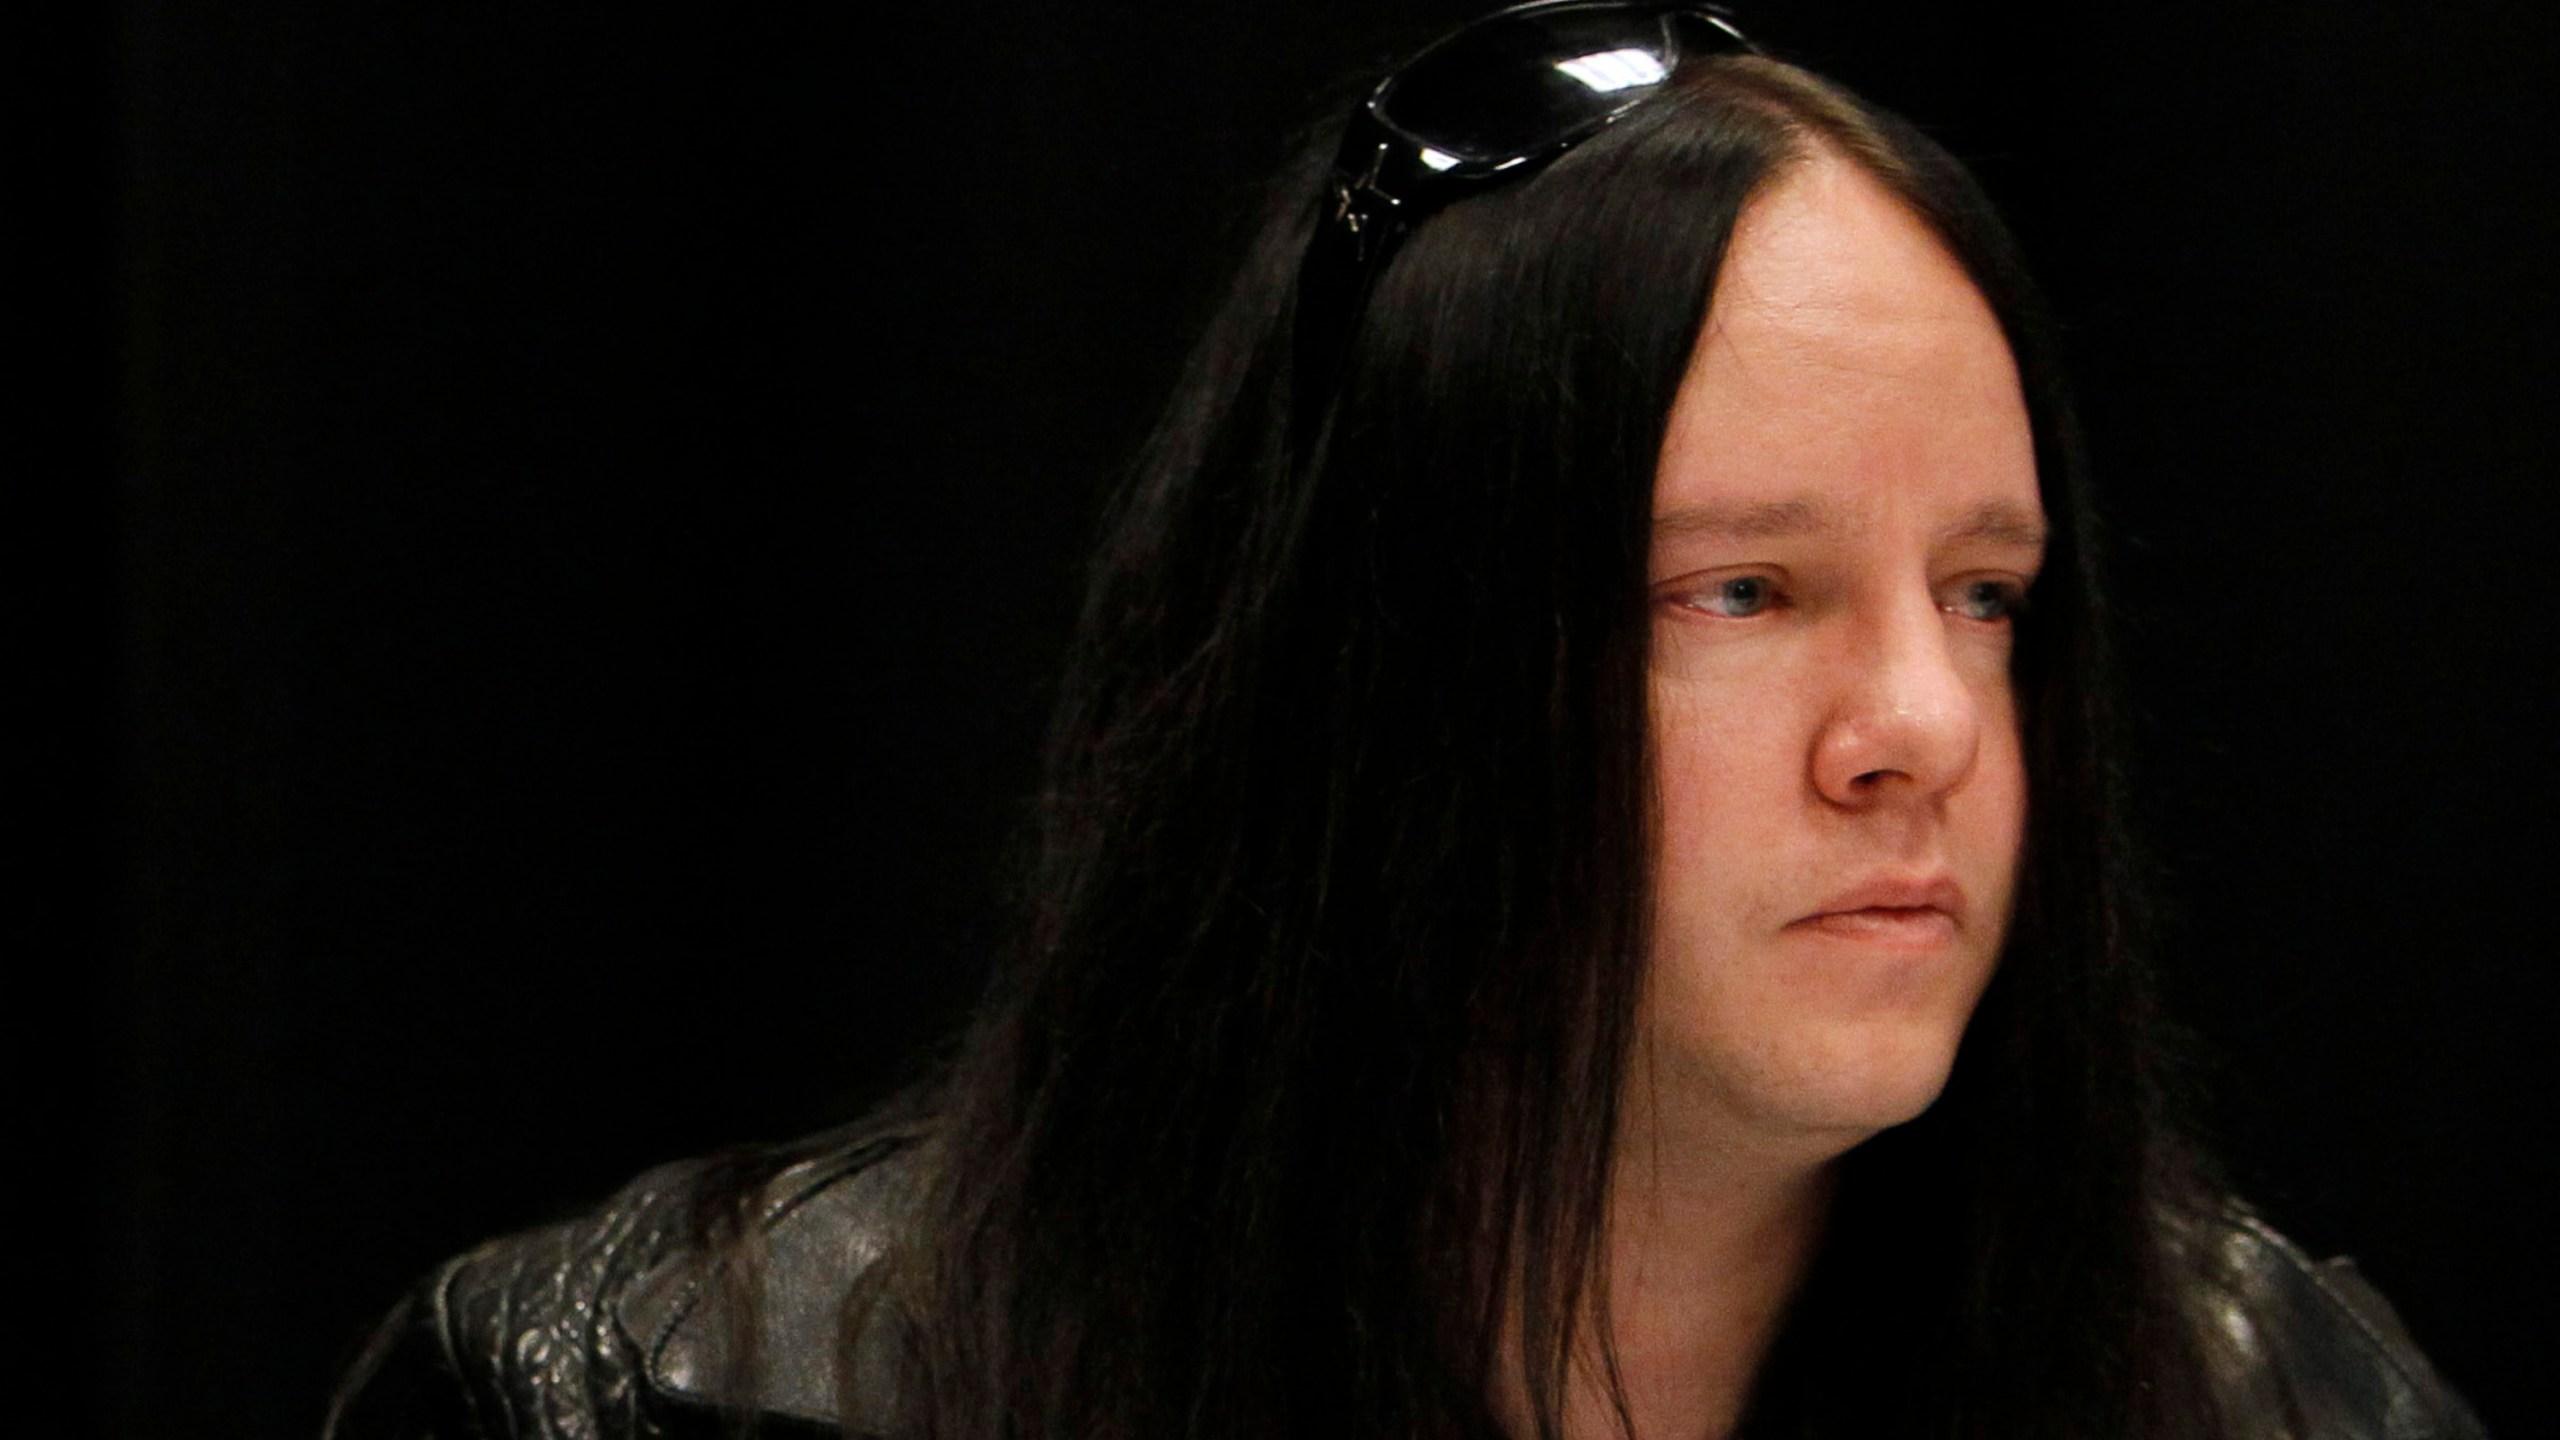 Brenna Gray, Joey Jordison